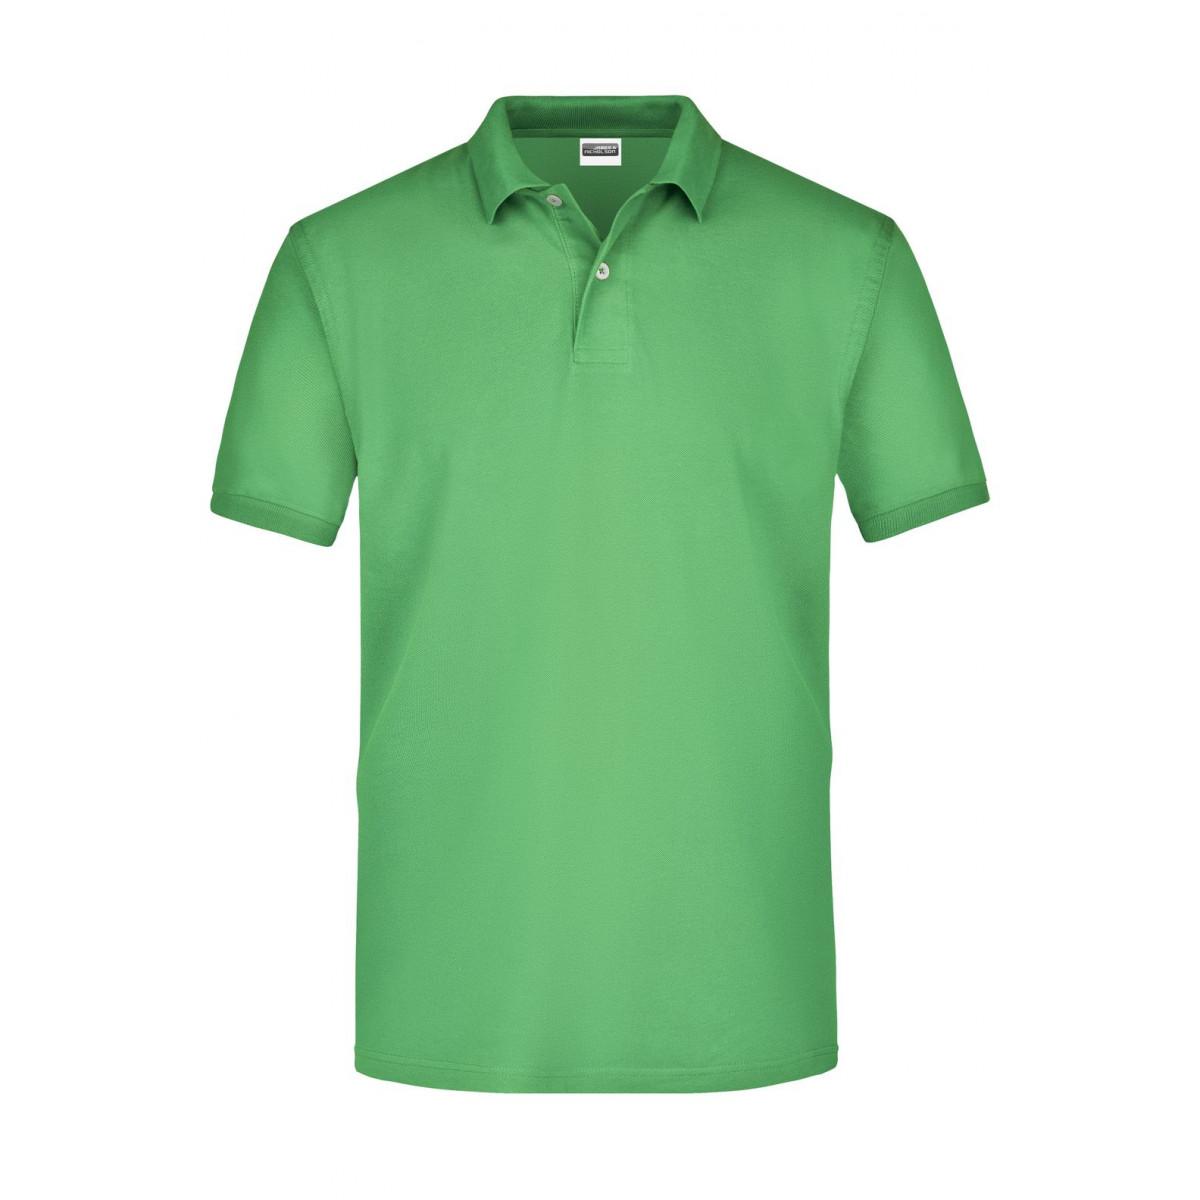 Рубашка поло мужская JN918 Basic Polo - Лайм